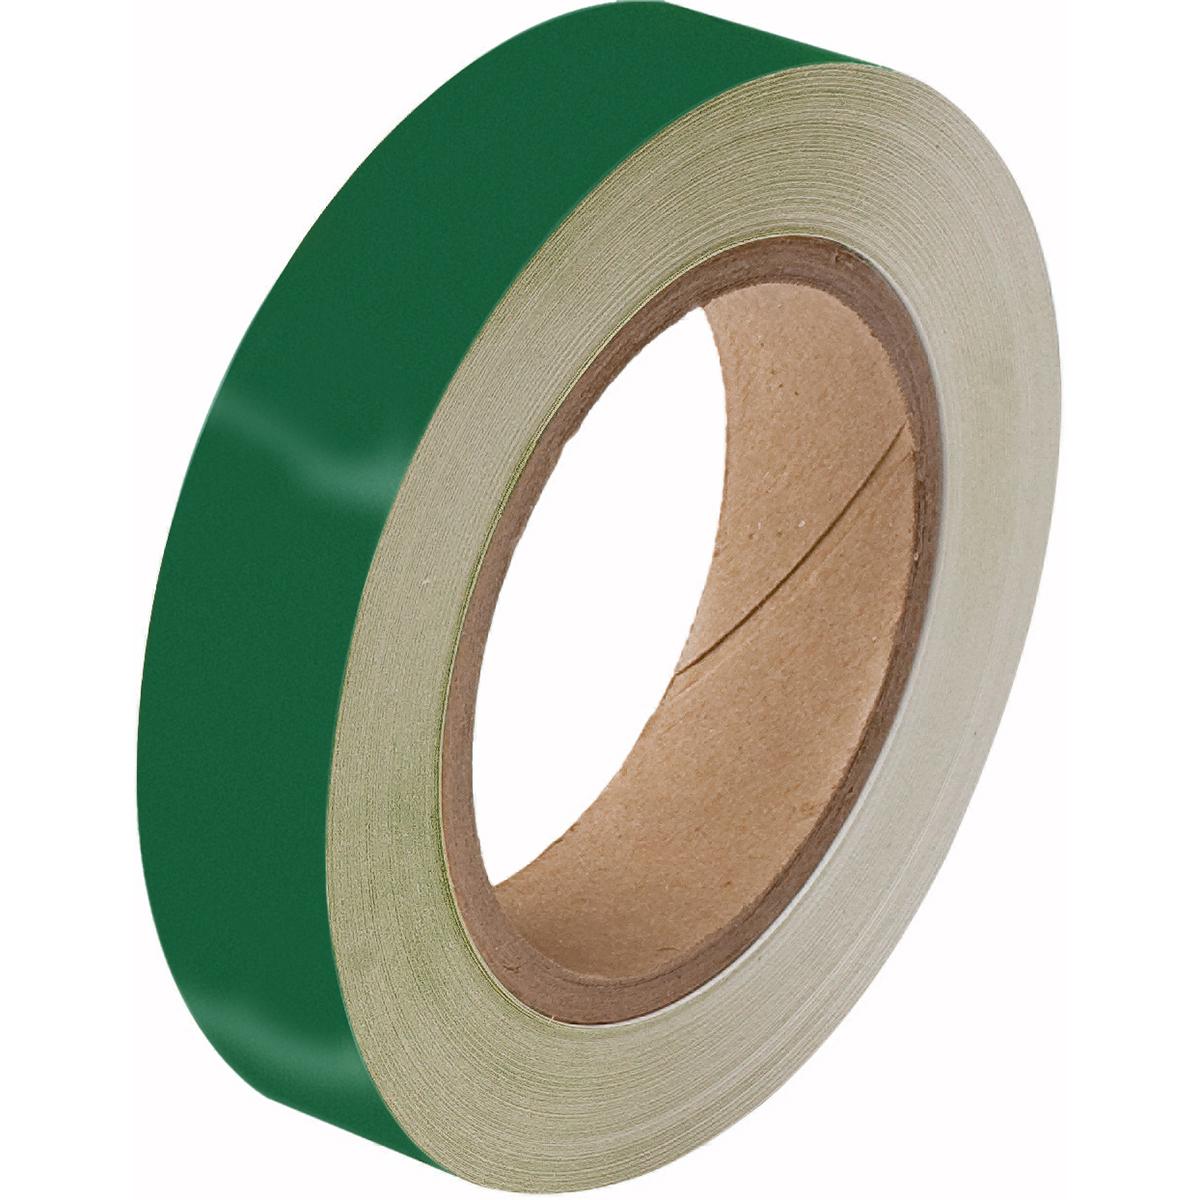 Pipe Banding Tape - Green